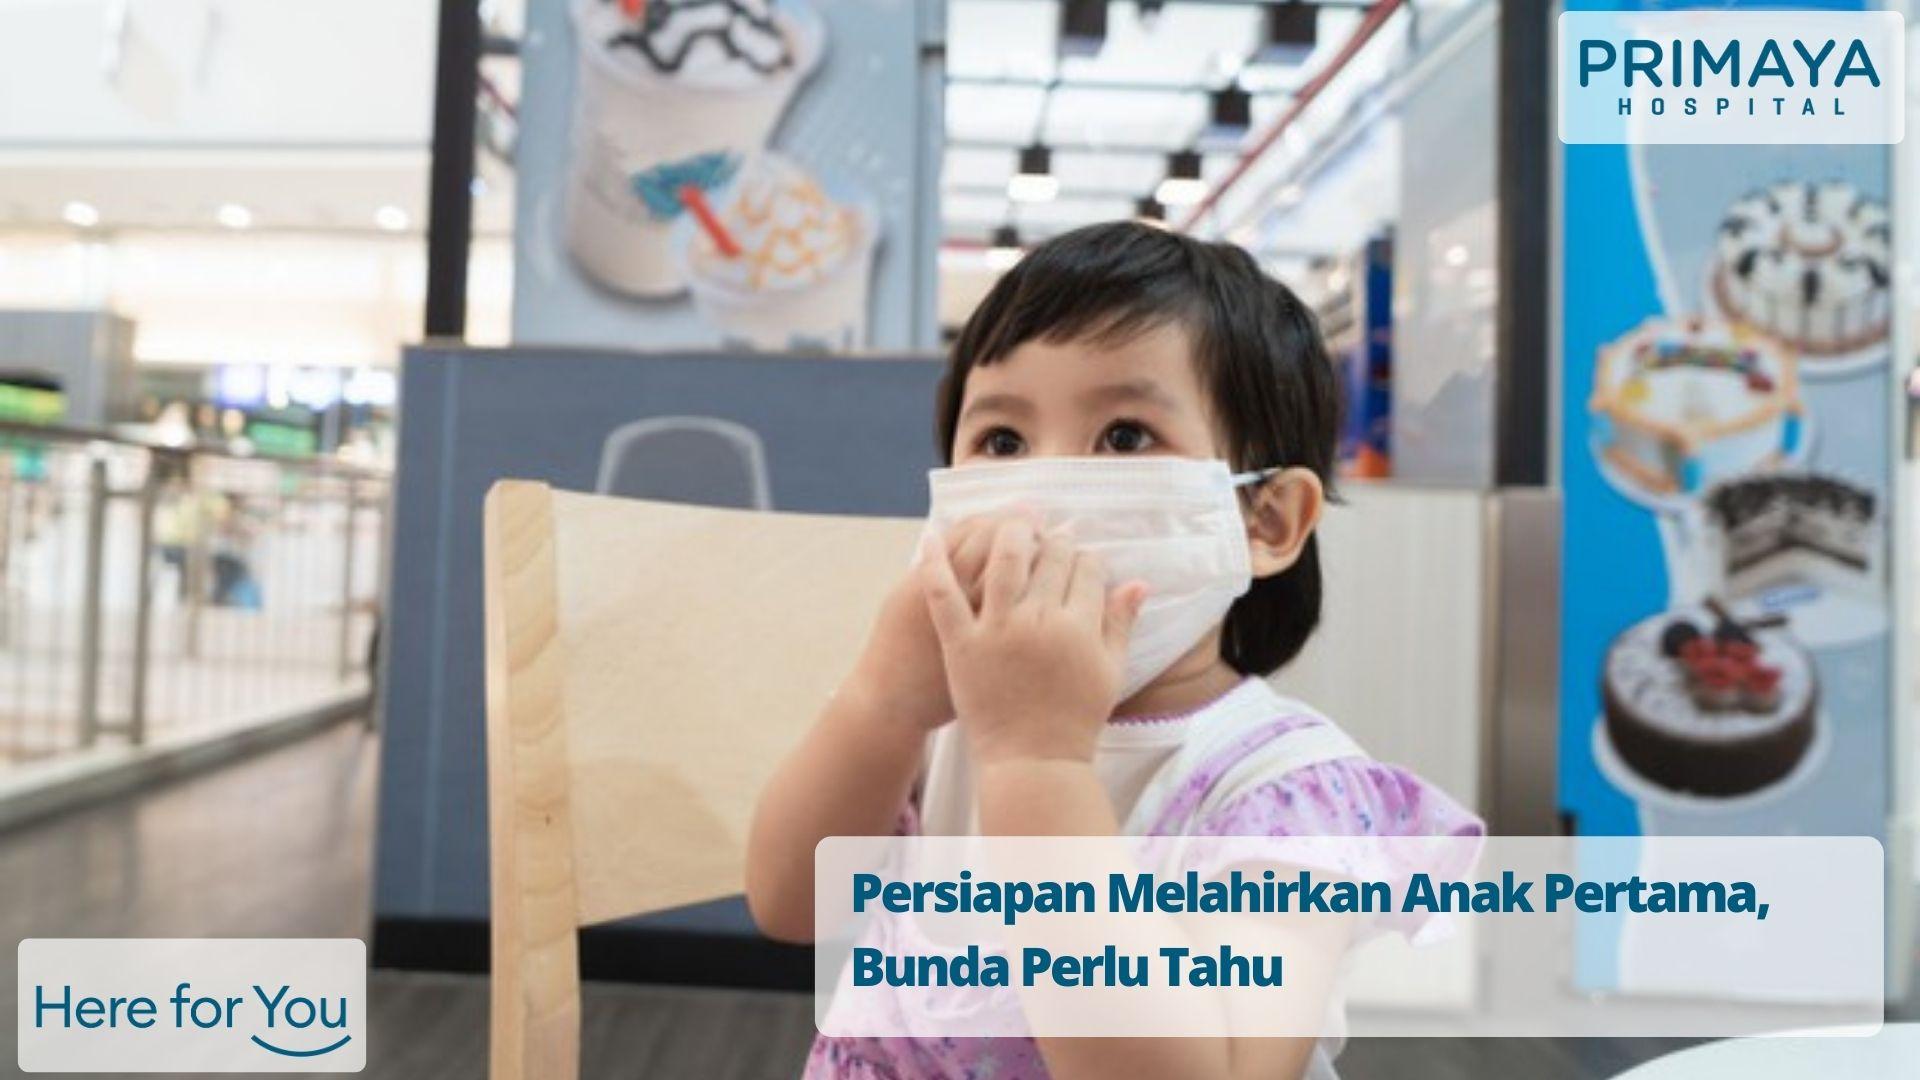 Persiapan Melahirkan Anak Pertama, Bunda Perlu Tahu